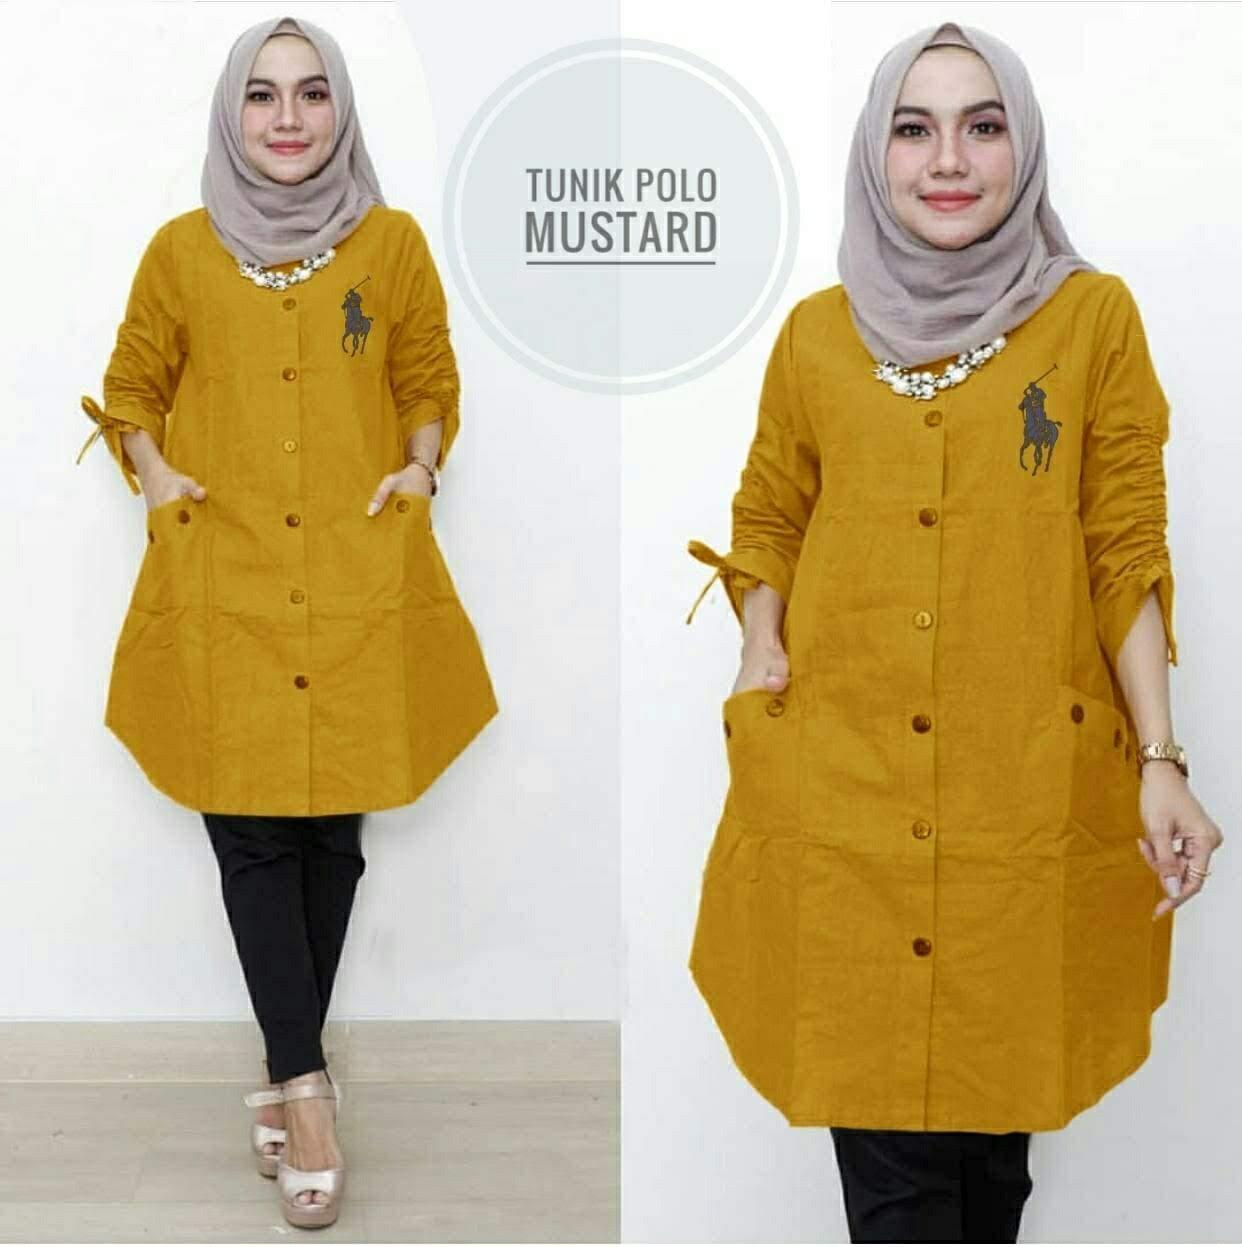 Tunik Muslim Polo - Atasan Fashion Wanita - Fashionable Tunik Aiko Maroon